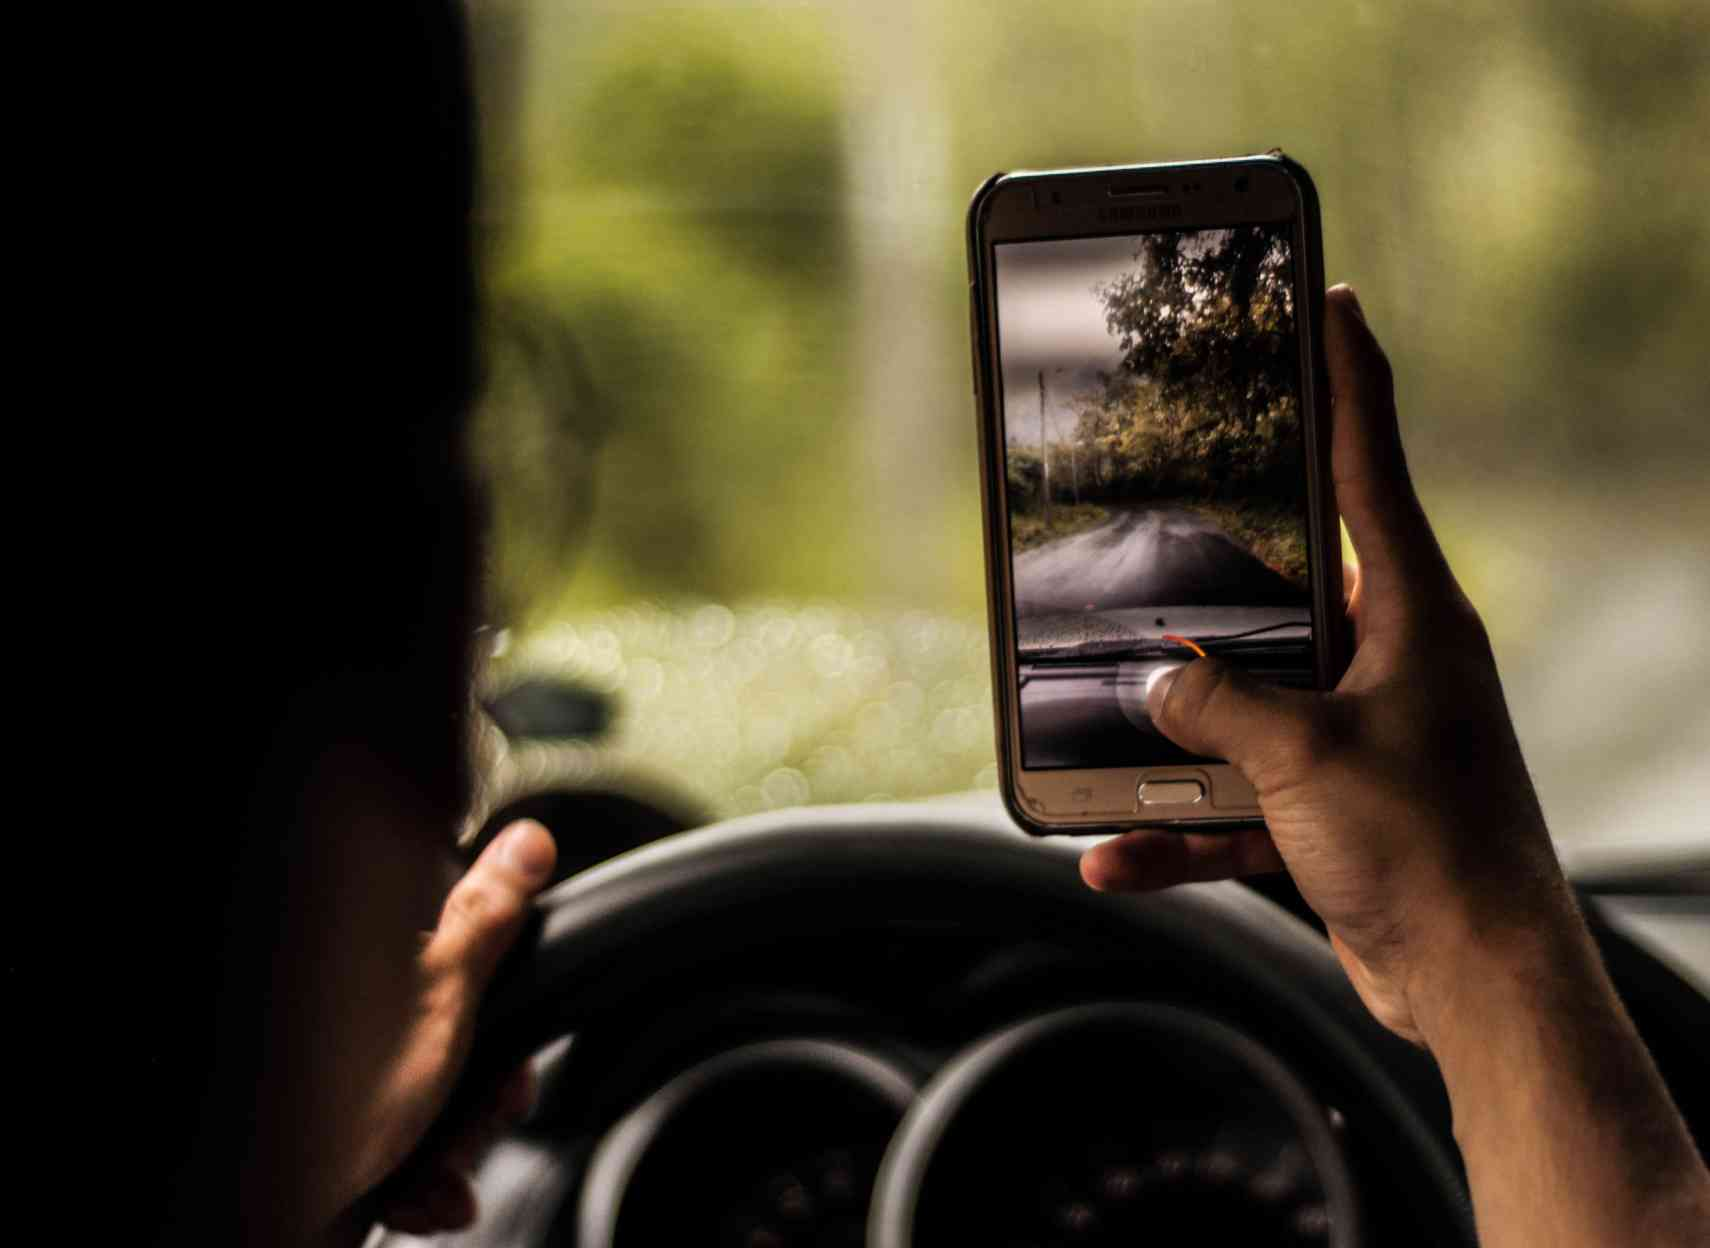 Kia campagne dangers smartphone au volant